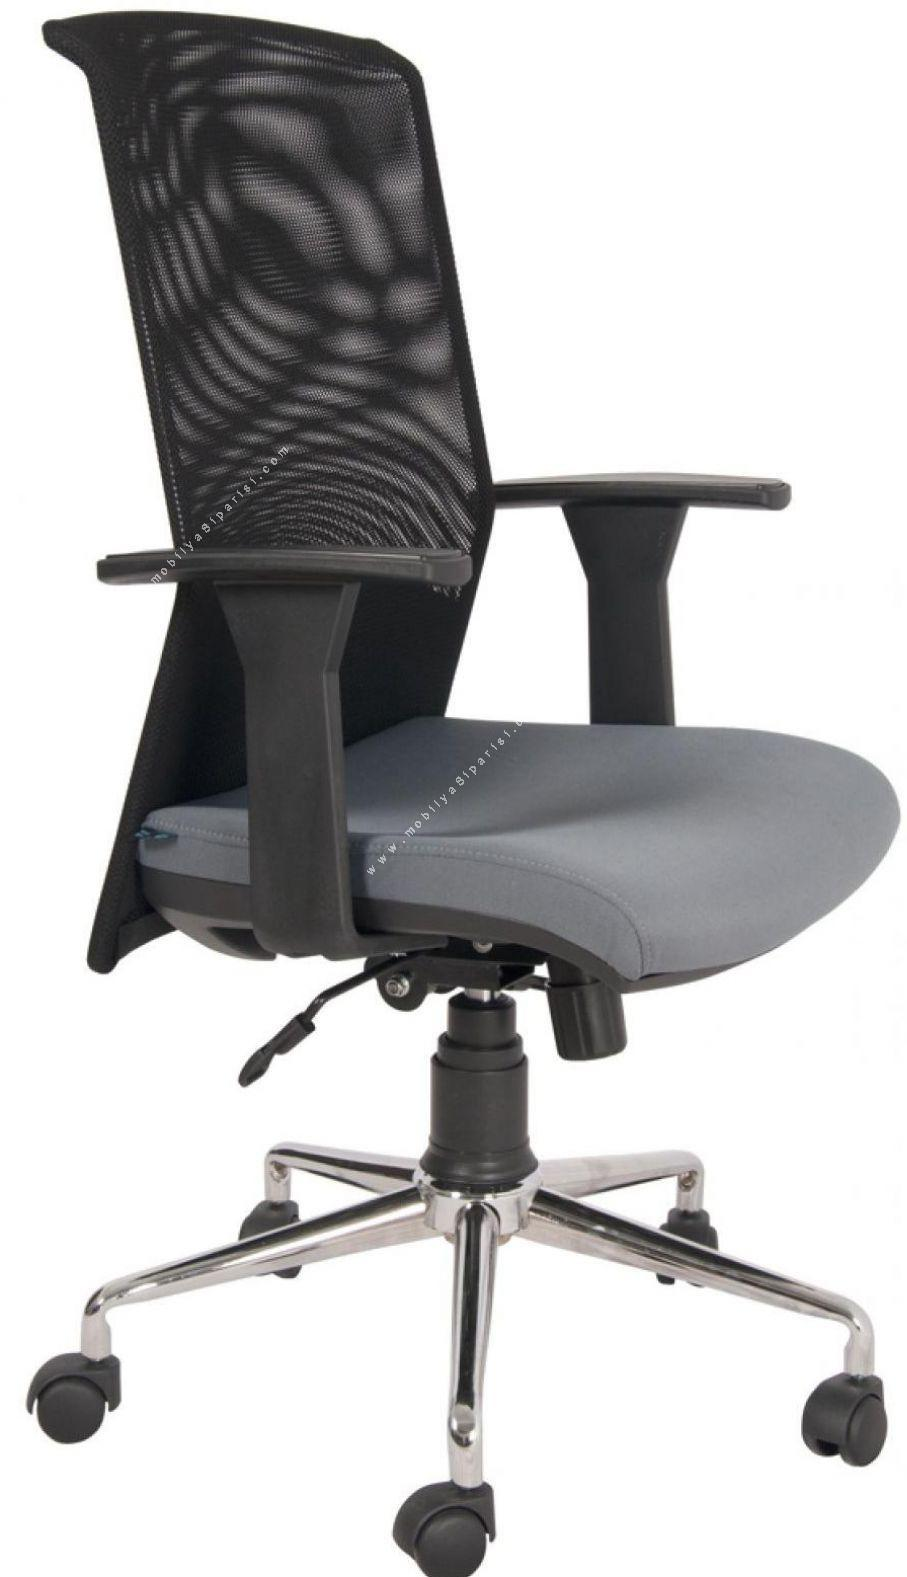 mose fileli krom çalışma koltuğu